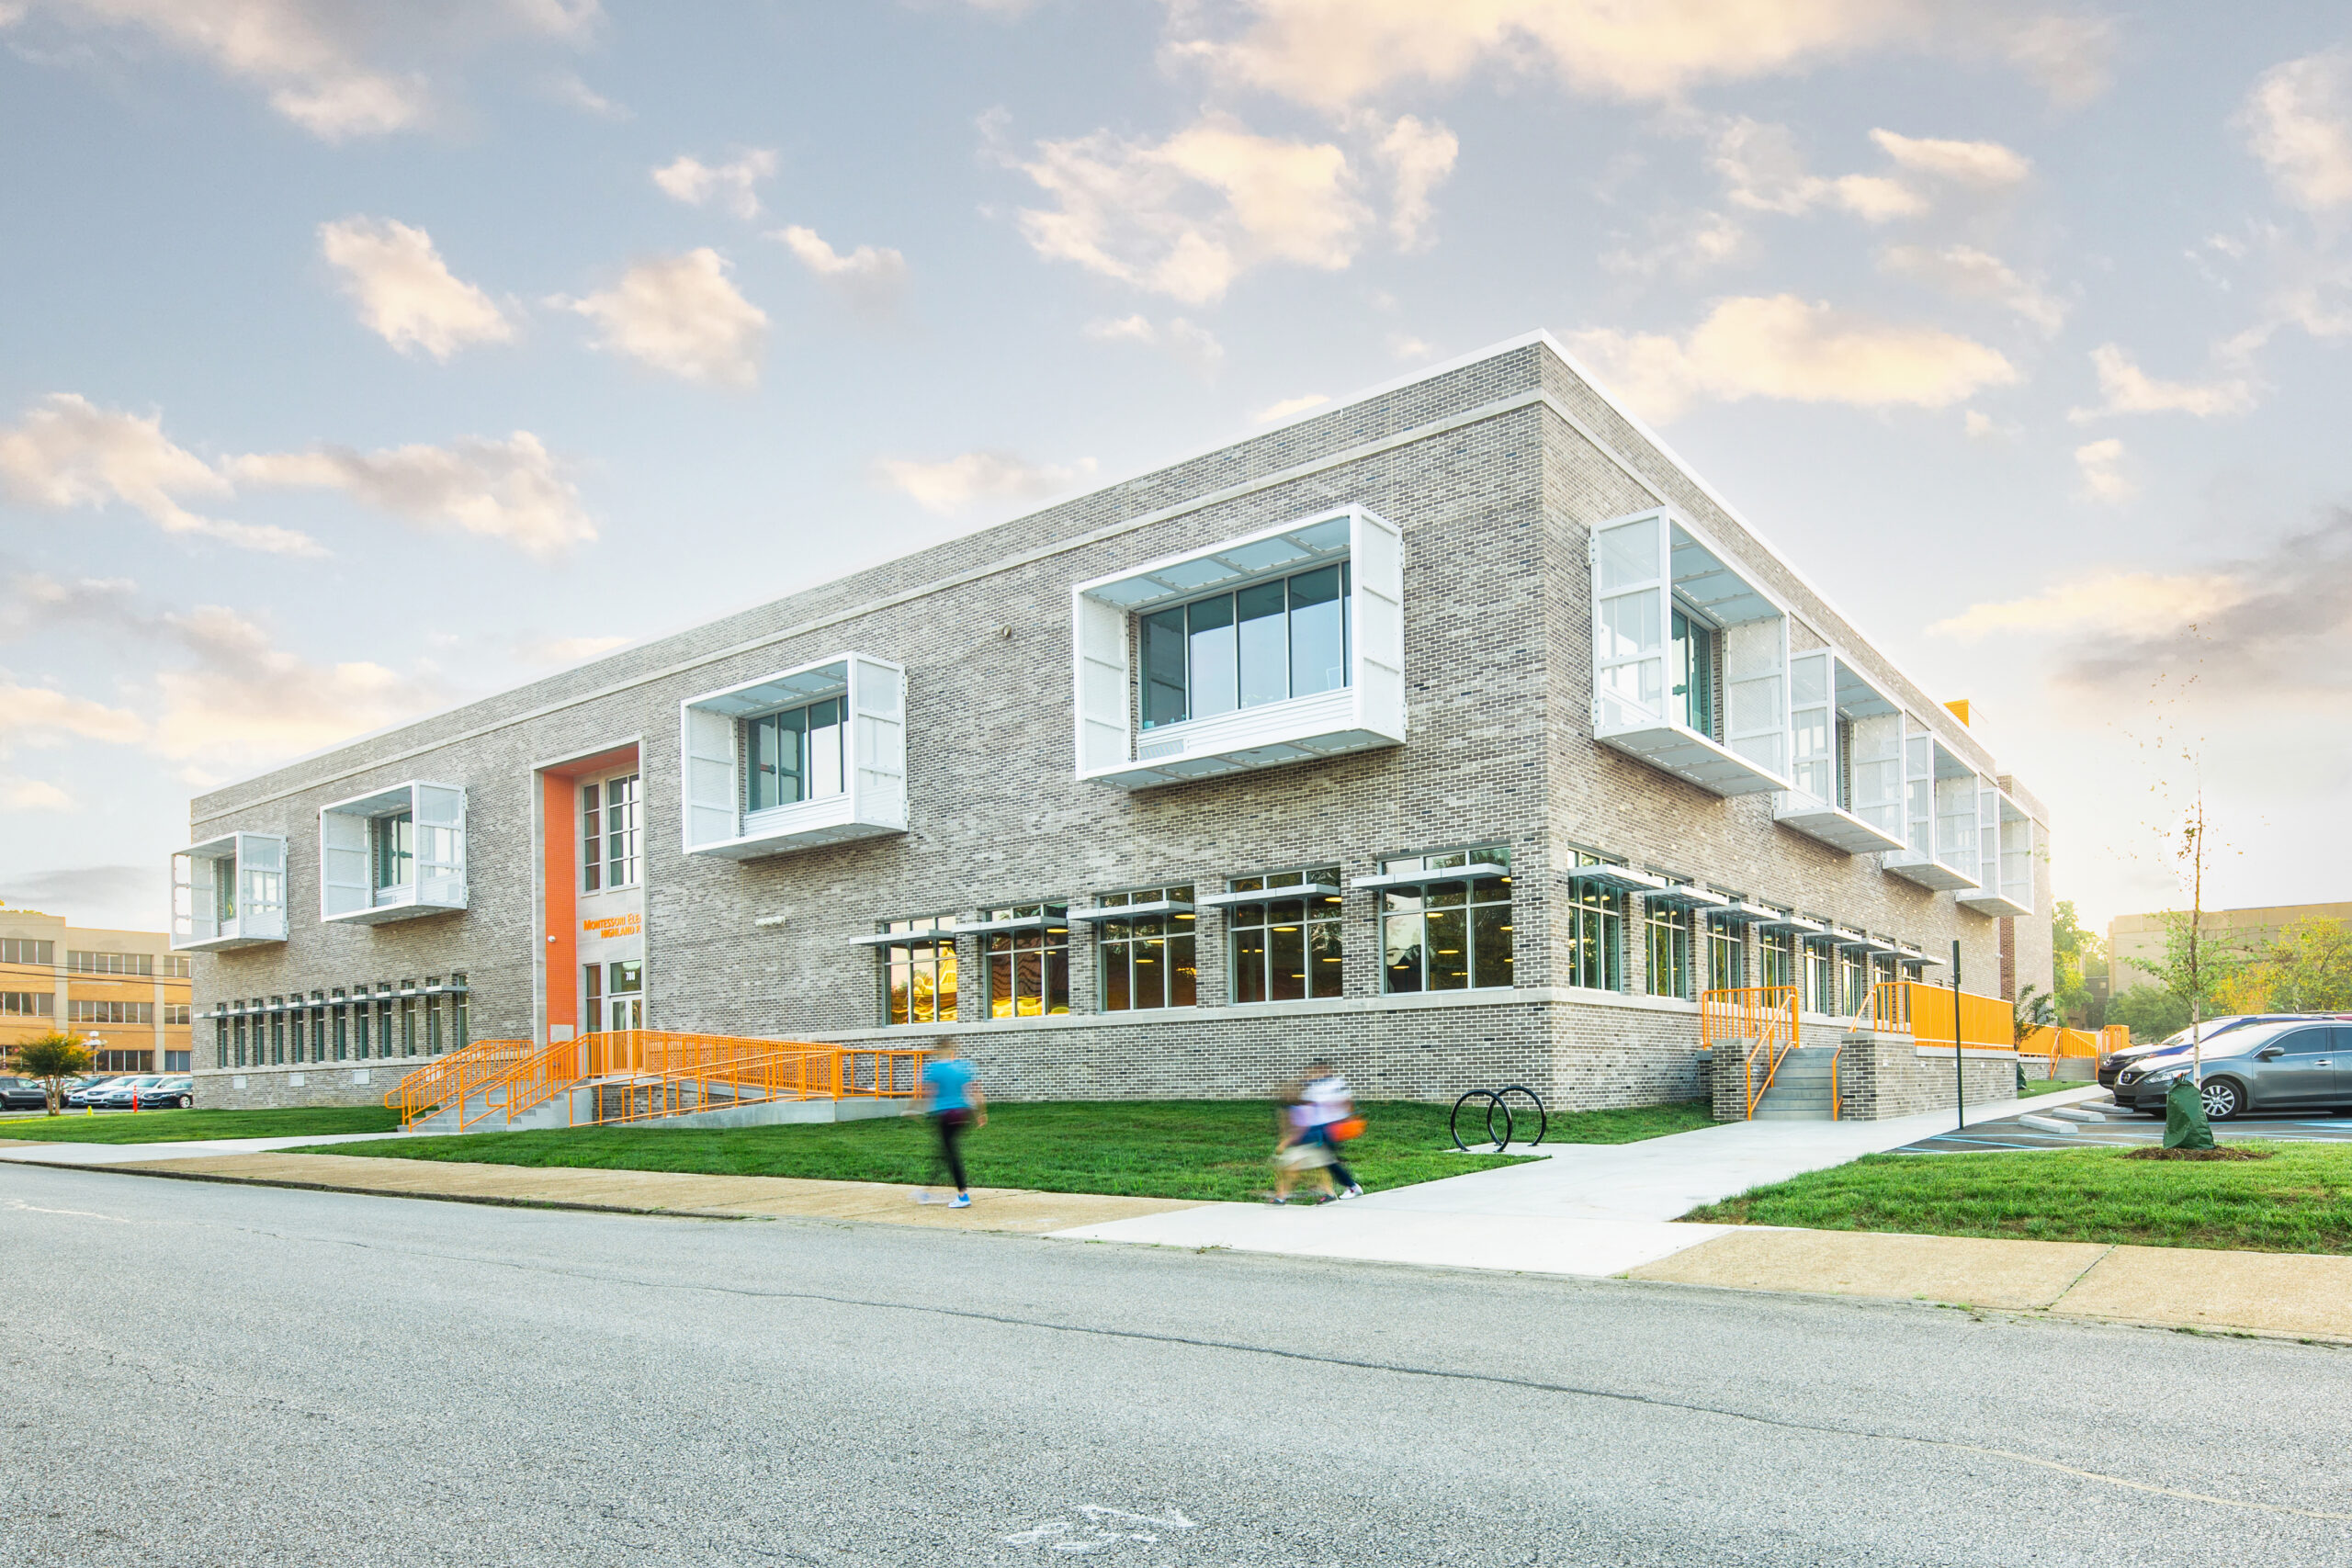 Montessori Elementary School